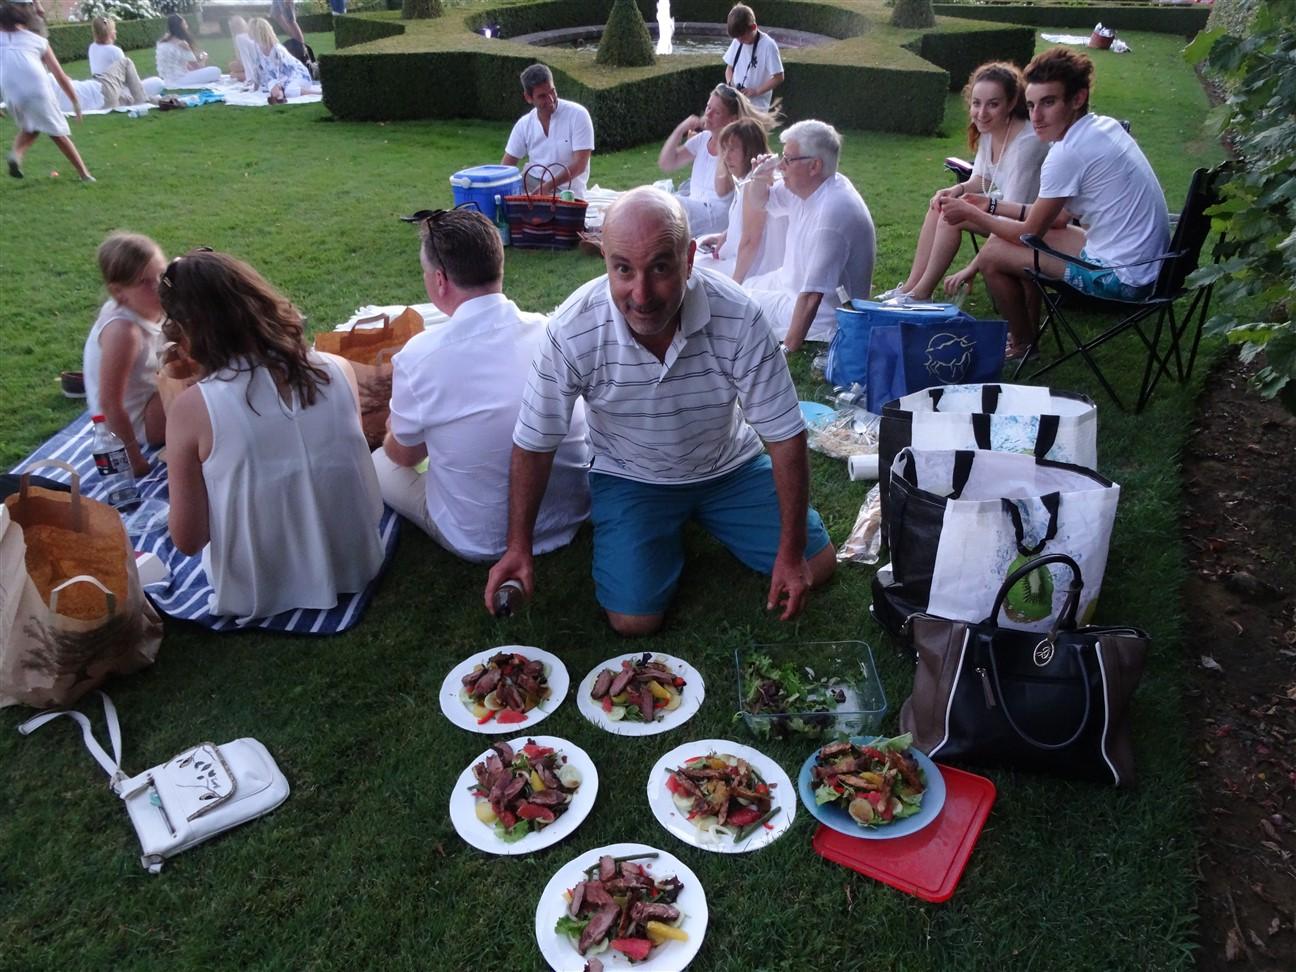 Les Jardins d'Eyriganc picnic blanc